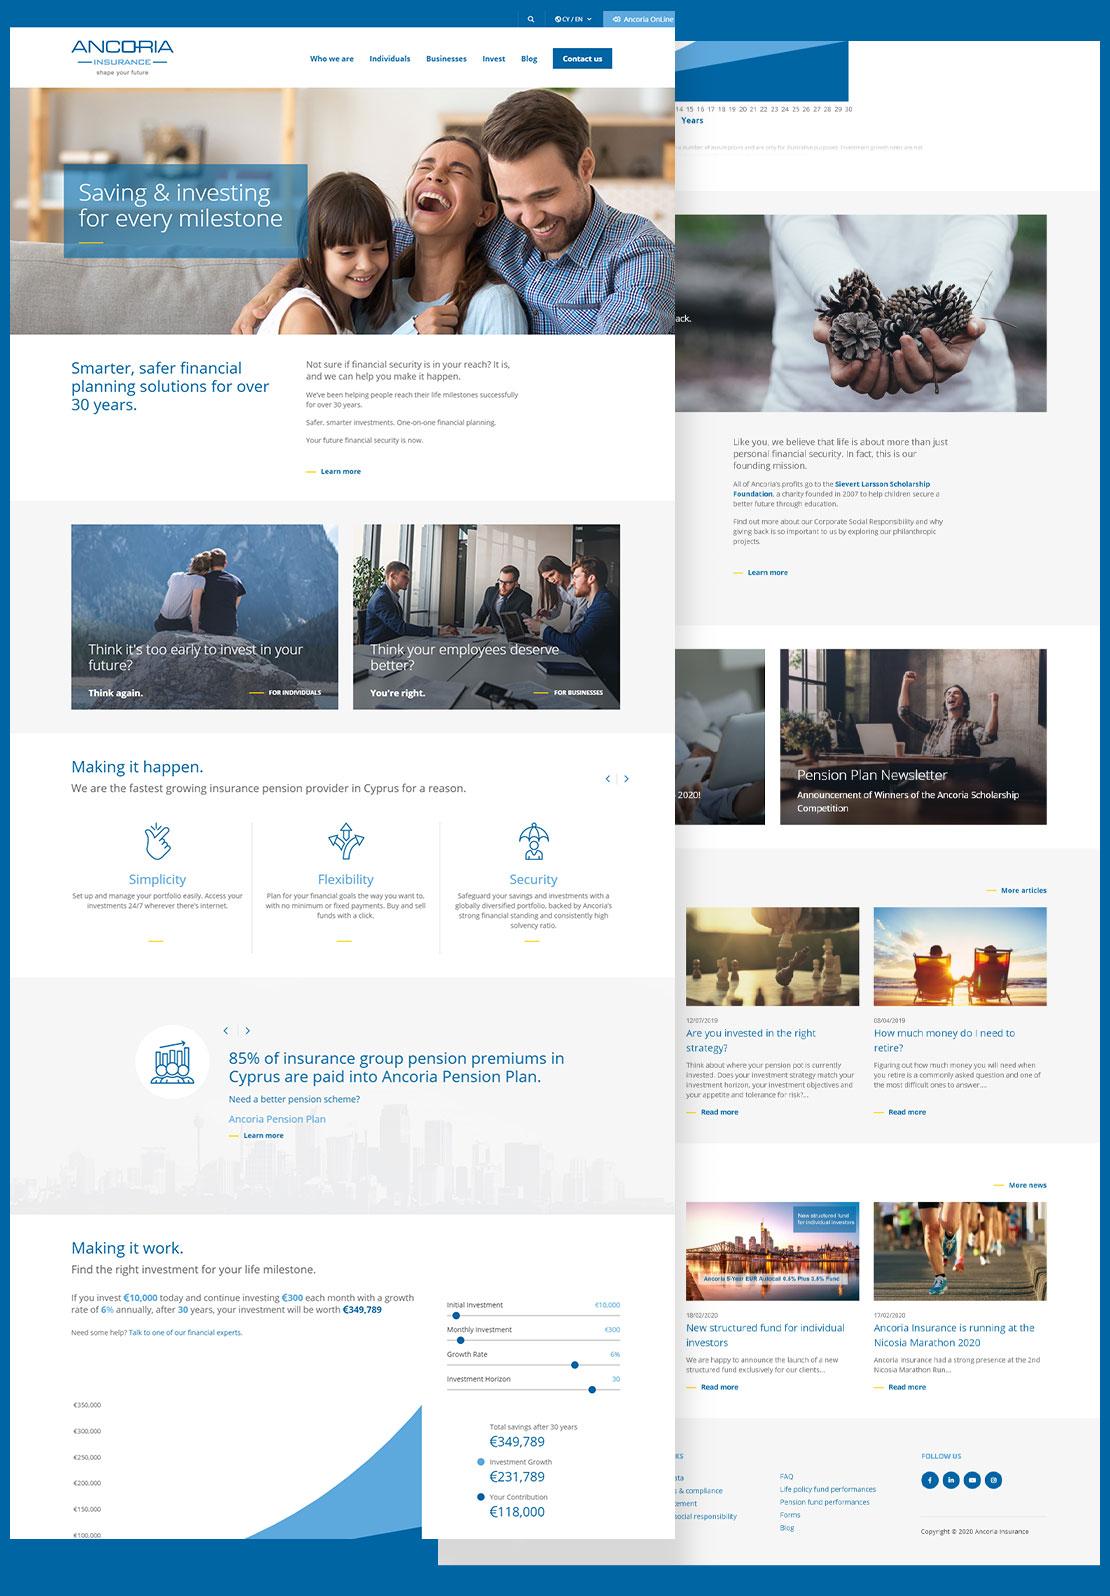 Ancoria_webdesign01d